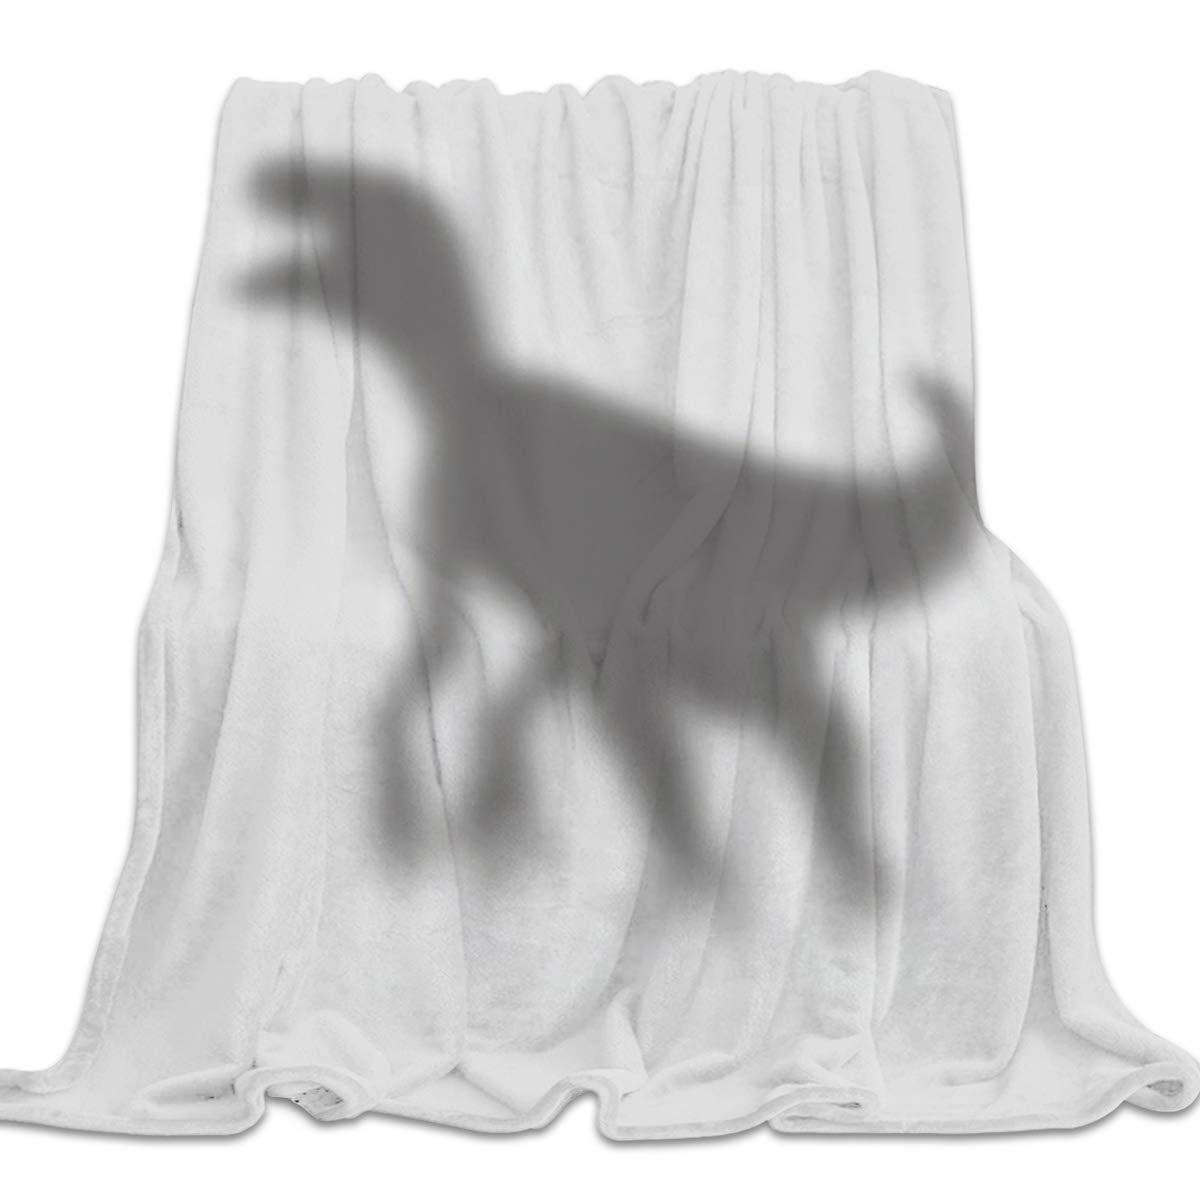 Shadow1yag7486 49x79inch=125x200cm YEHO Art Gallery 39x49 Inch Flannel Fleece Bed Blanket Soft Throw-Blankets for Girls Boys,Failure Blackboard Pattern Grey,Lightweight Warm Kids Blankets for Bedroom Living Room Sofa Couch Home Decor